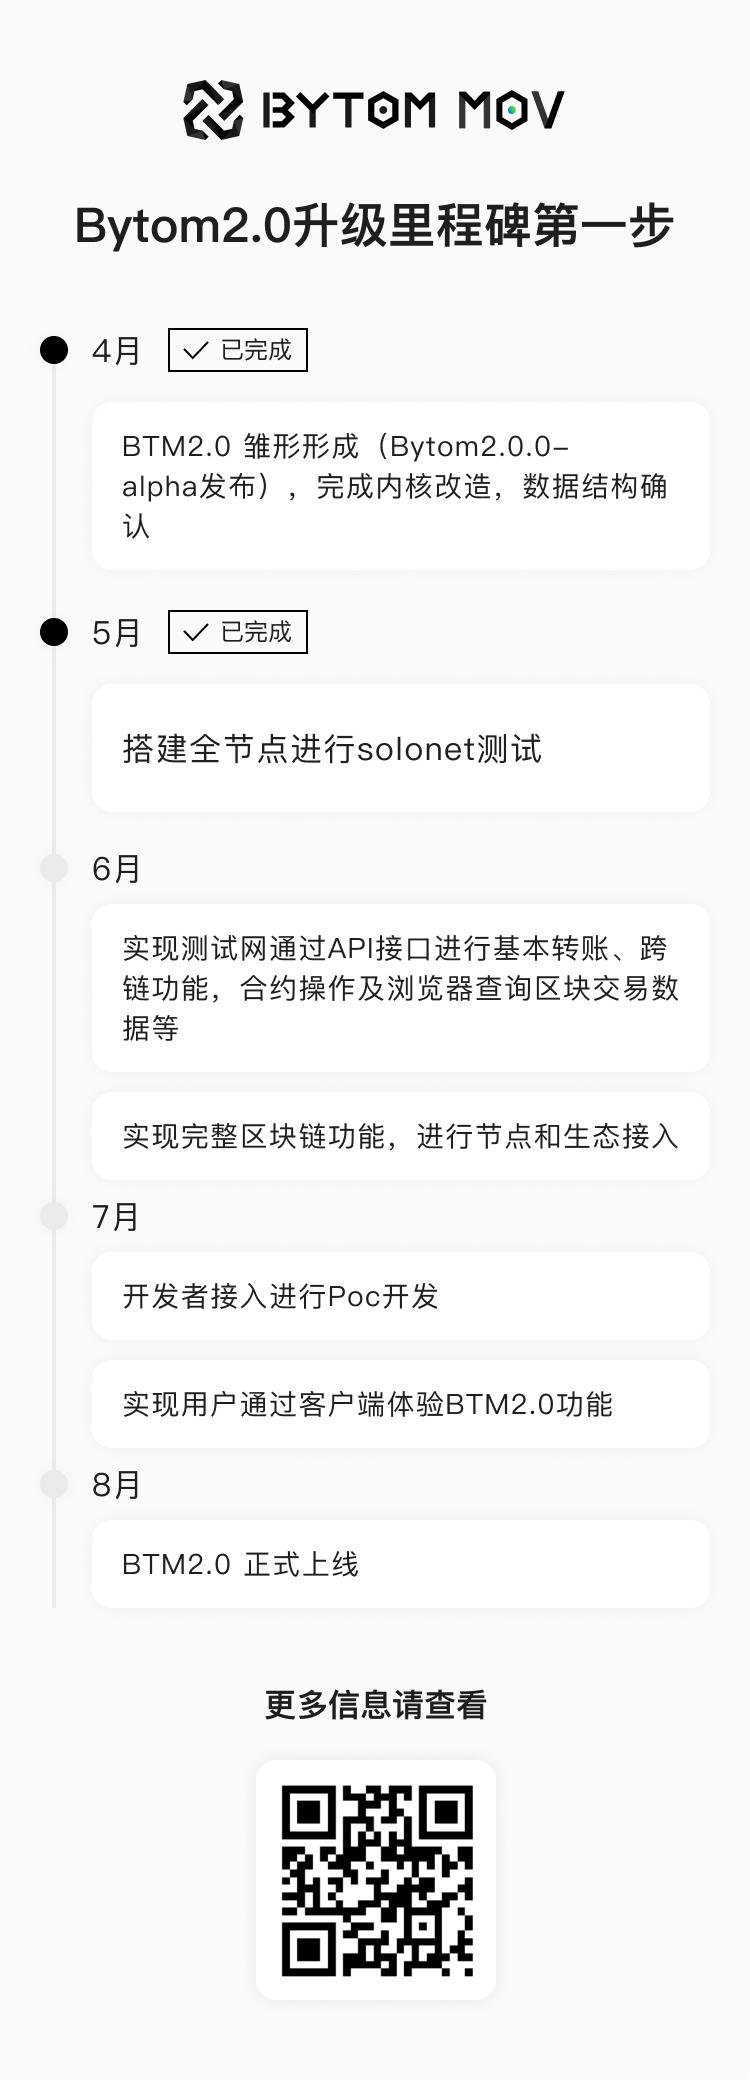 Bytom2.0 Solonet版正式发布